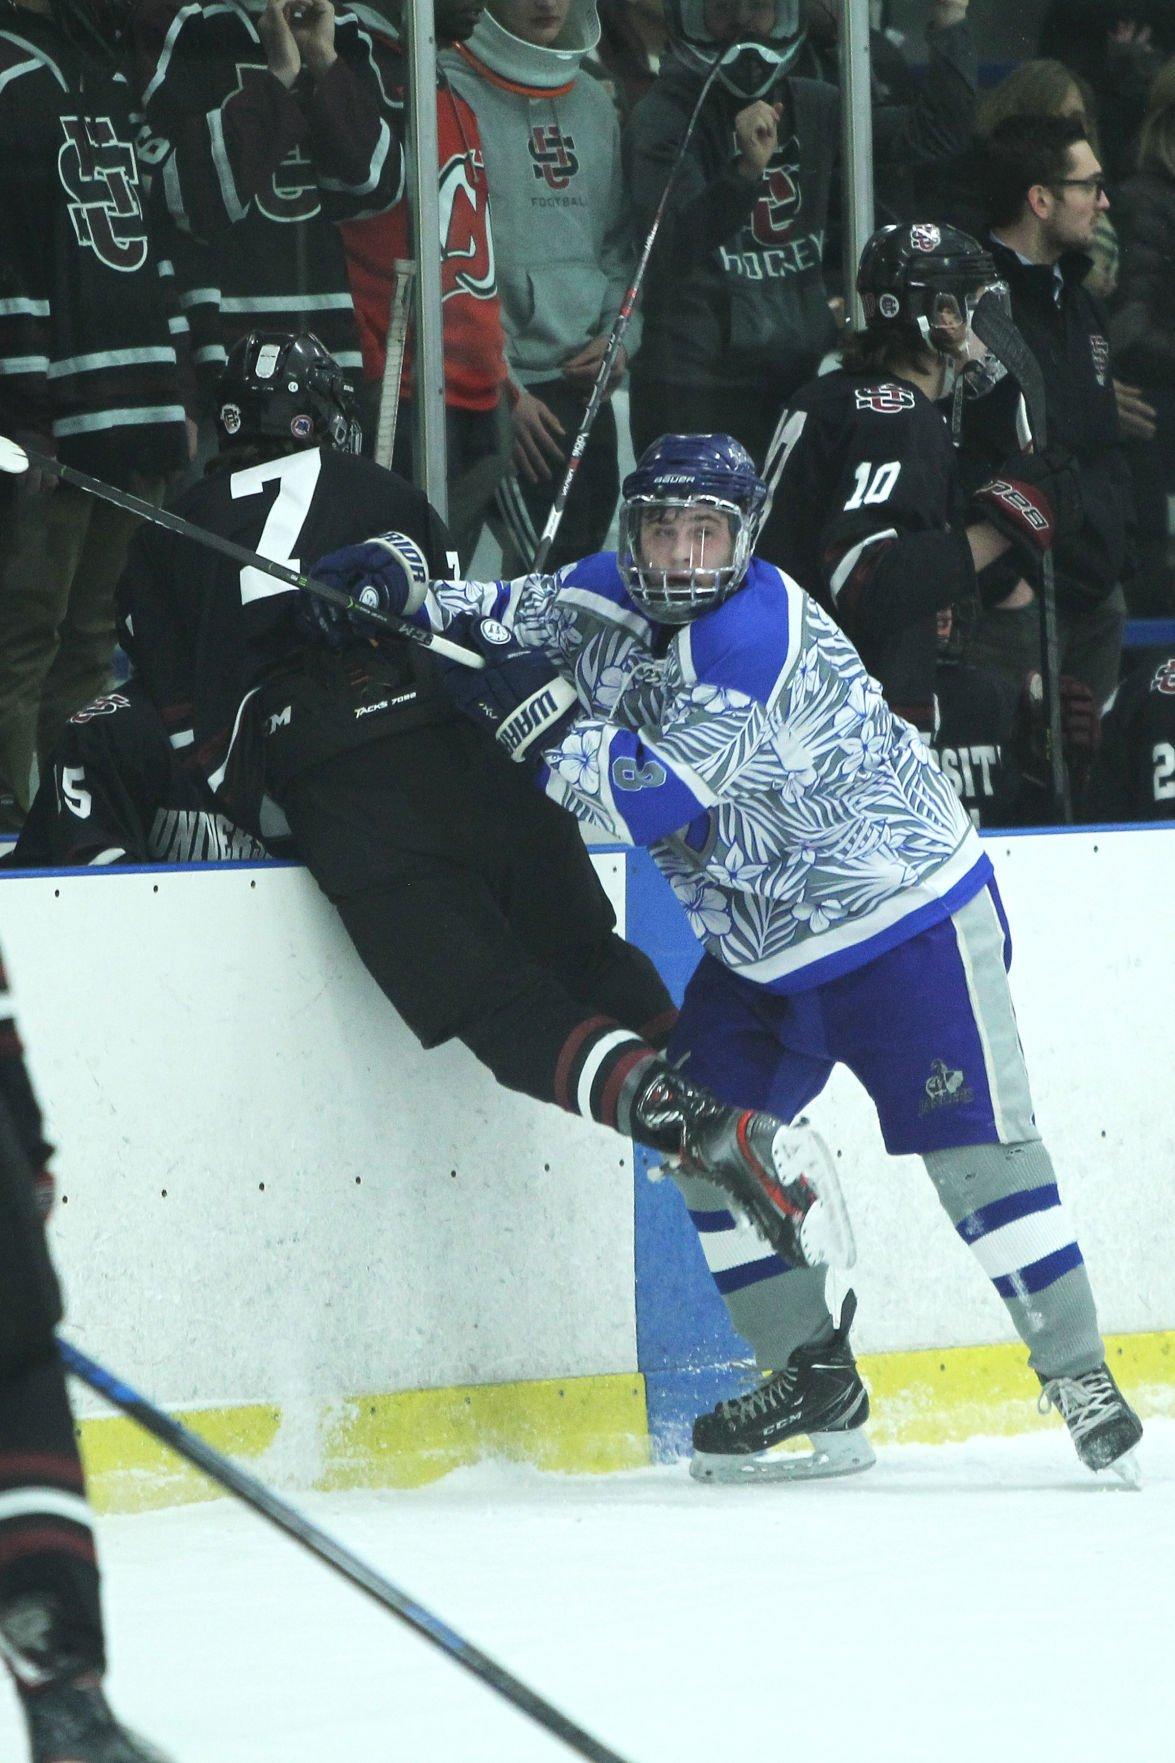 gahockey2